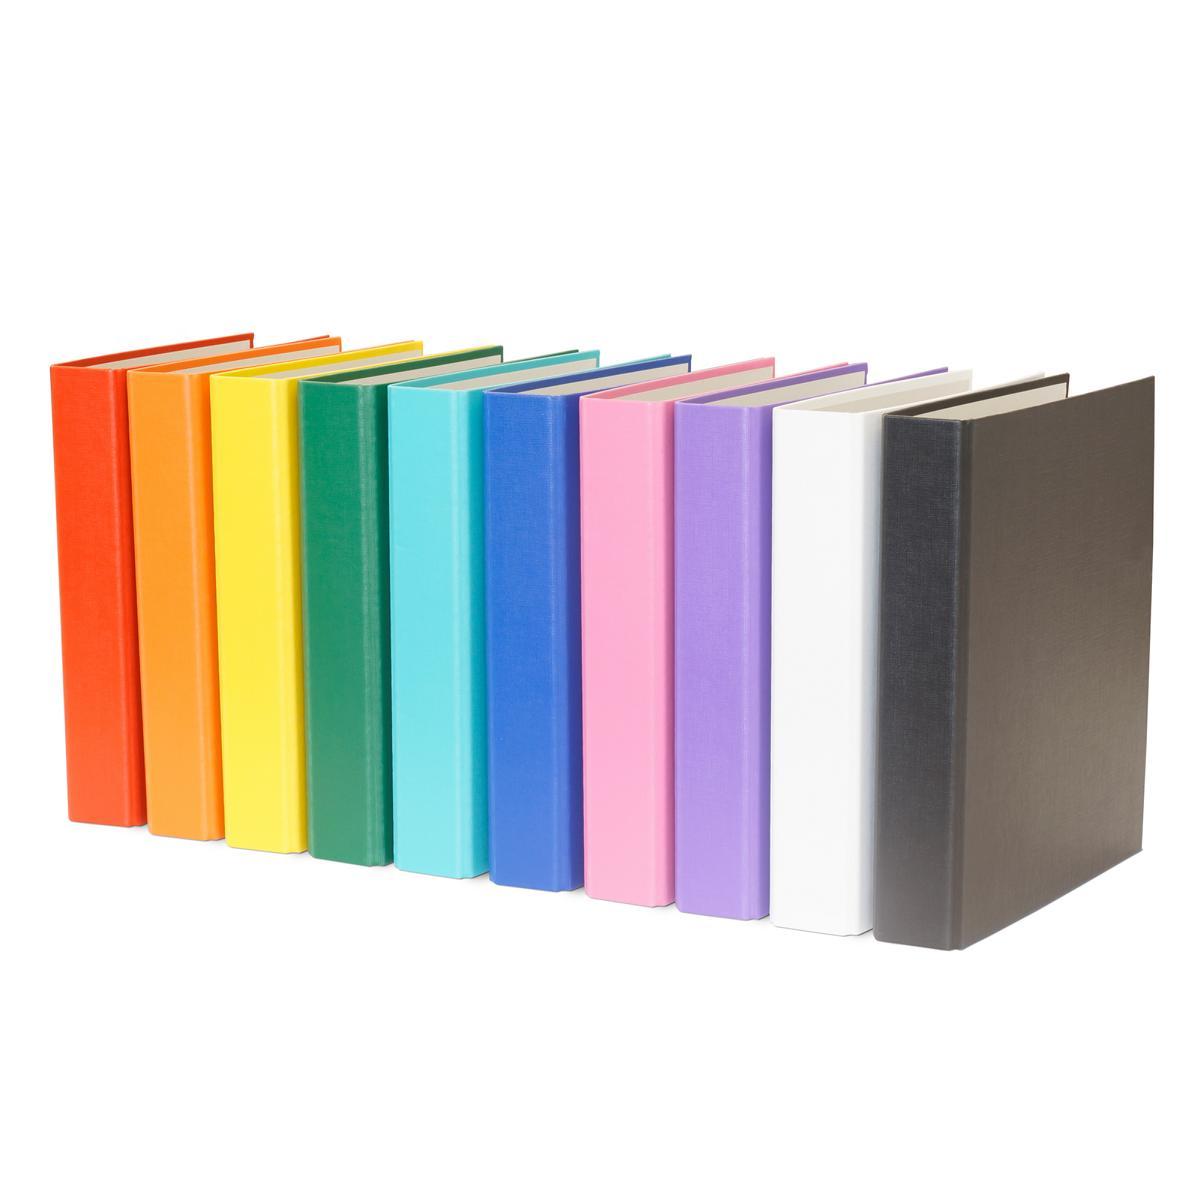 10x Ringbuch Din A5 2 Ring Ordner 10 Verschiedene Farben Ebay